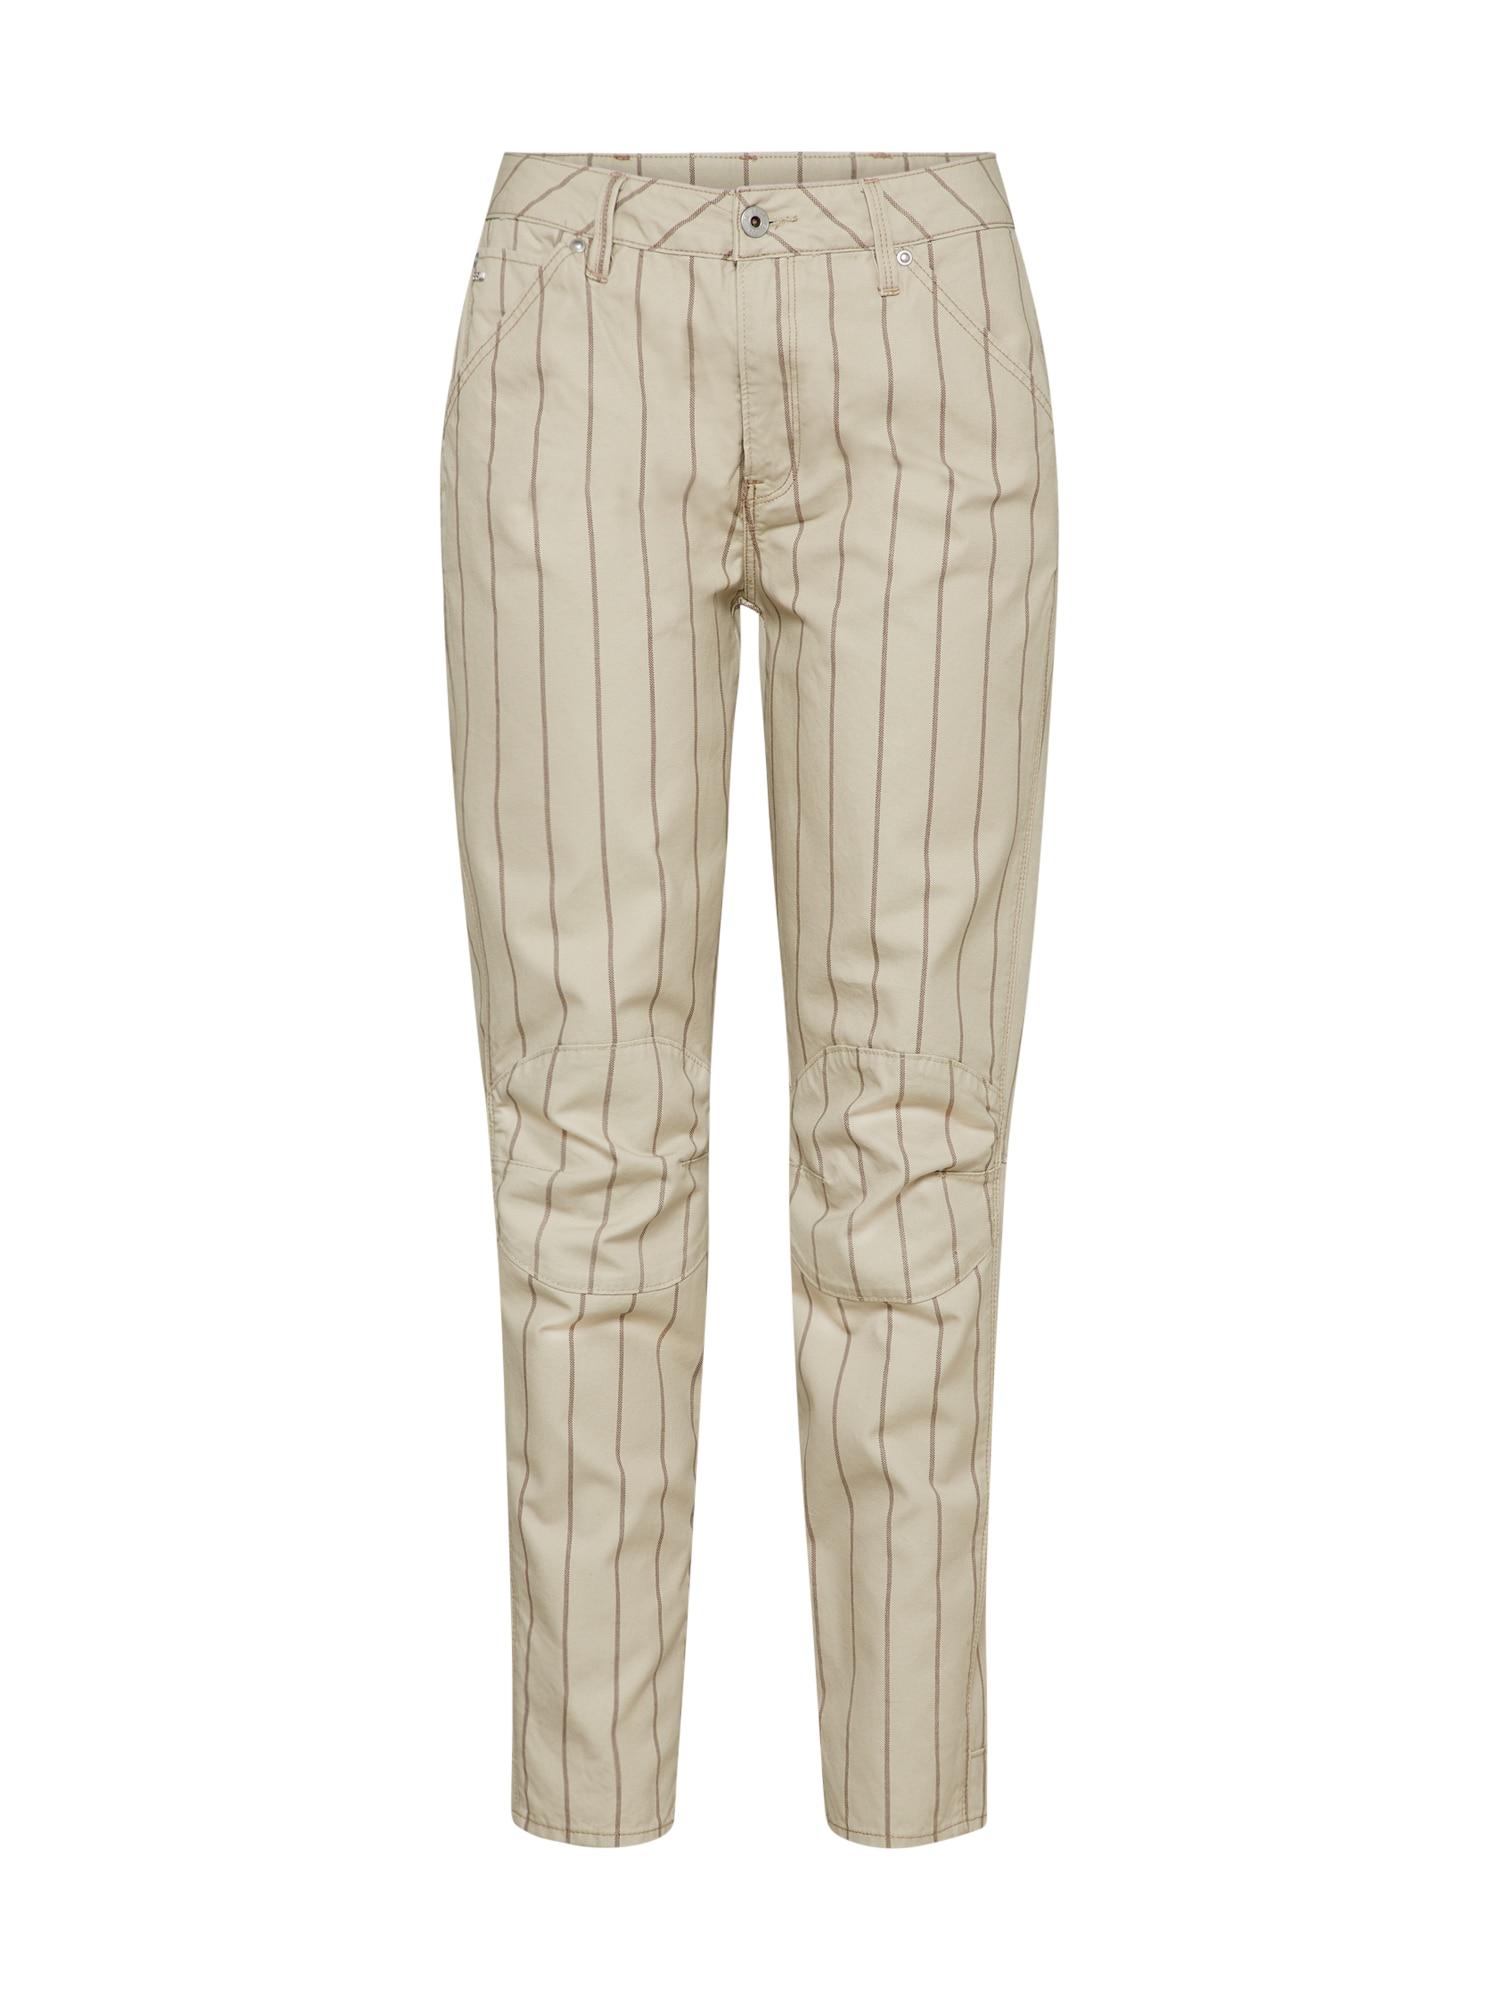 G-STAR RAW Dames Jeans 5622 3D beige